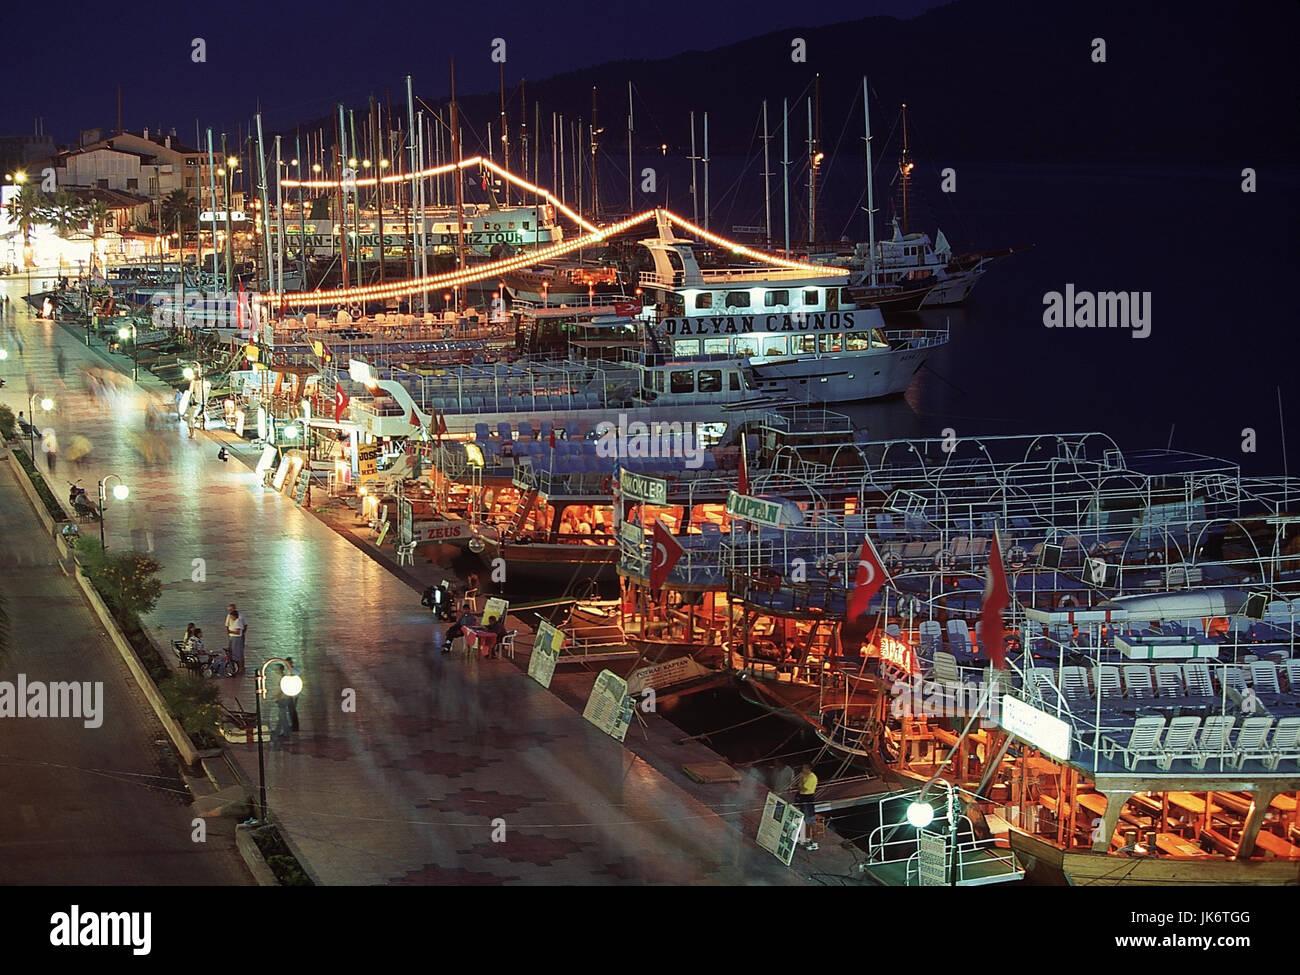 Türkei, Provinz Mugla, Marmaris,  Hafen, Uferpromenade 'Kordon', Charter-Boote, Nacht Ägäisches - Stock Image